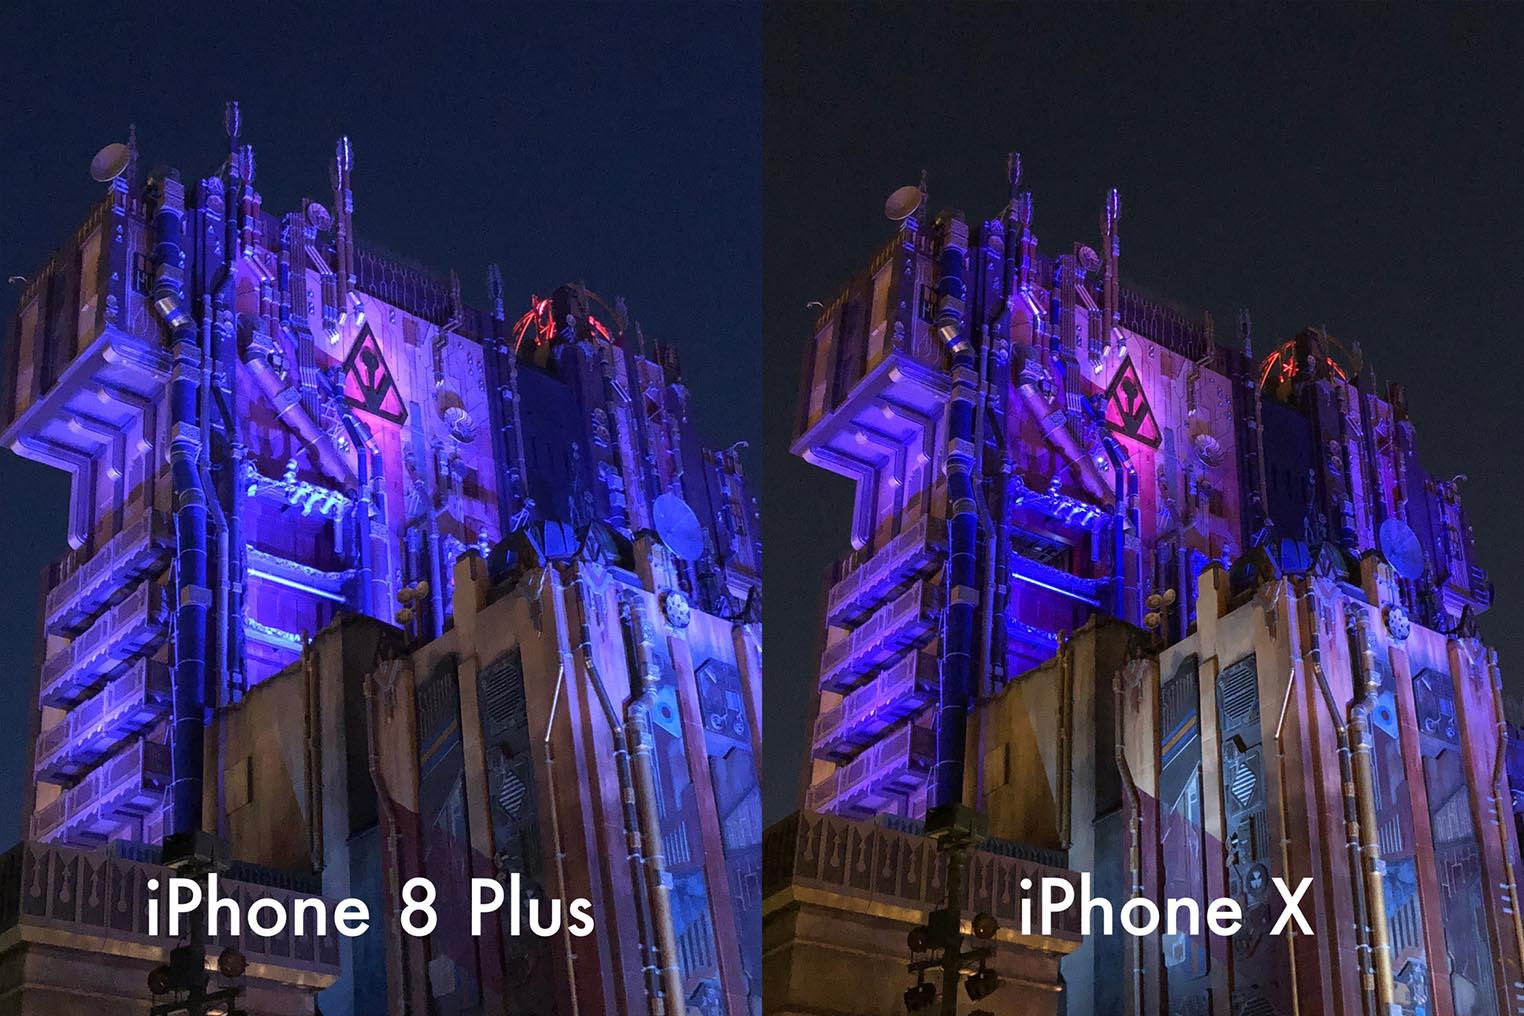 iPhone X test appareil photo